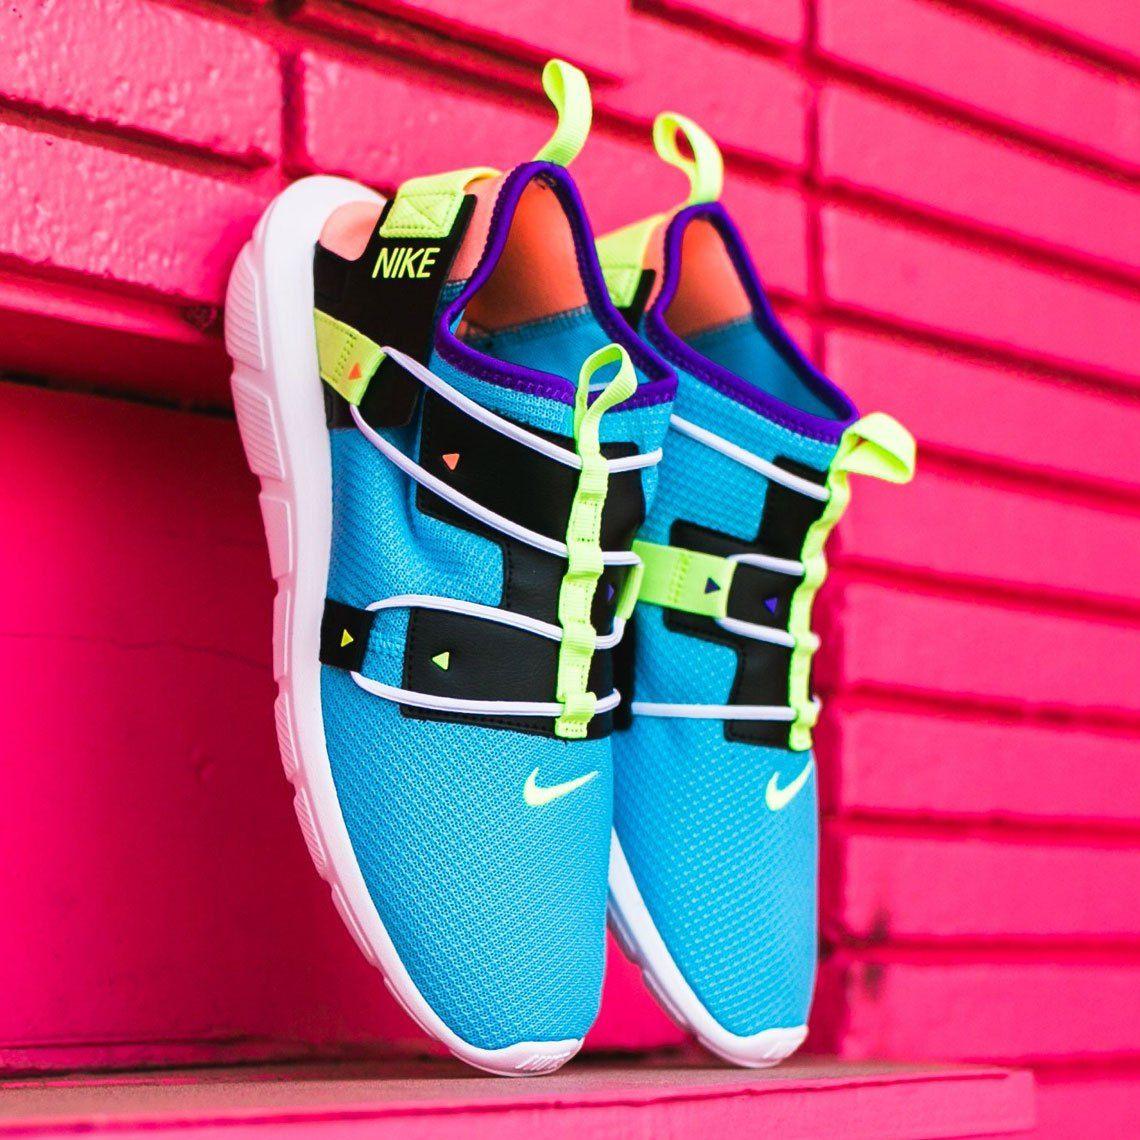 Nike Vortak Lifestyle Shoe Buy Now